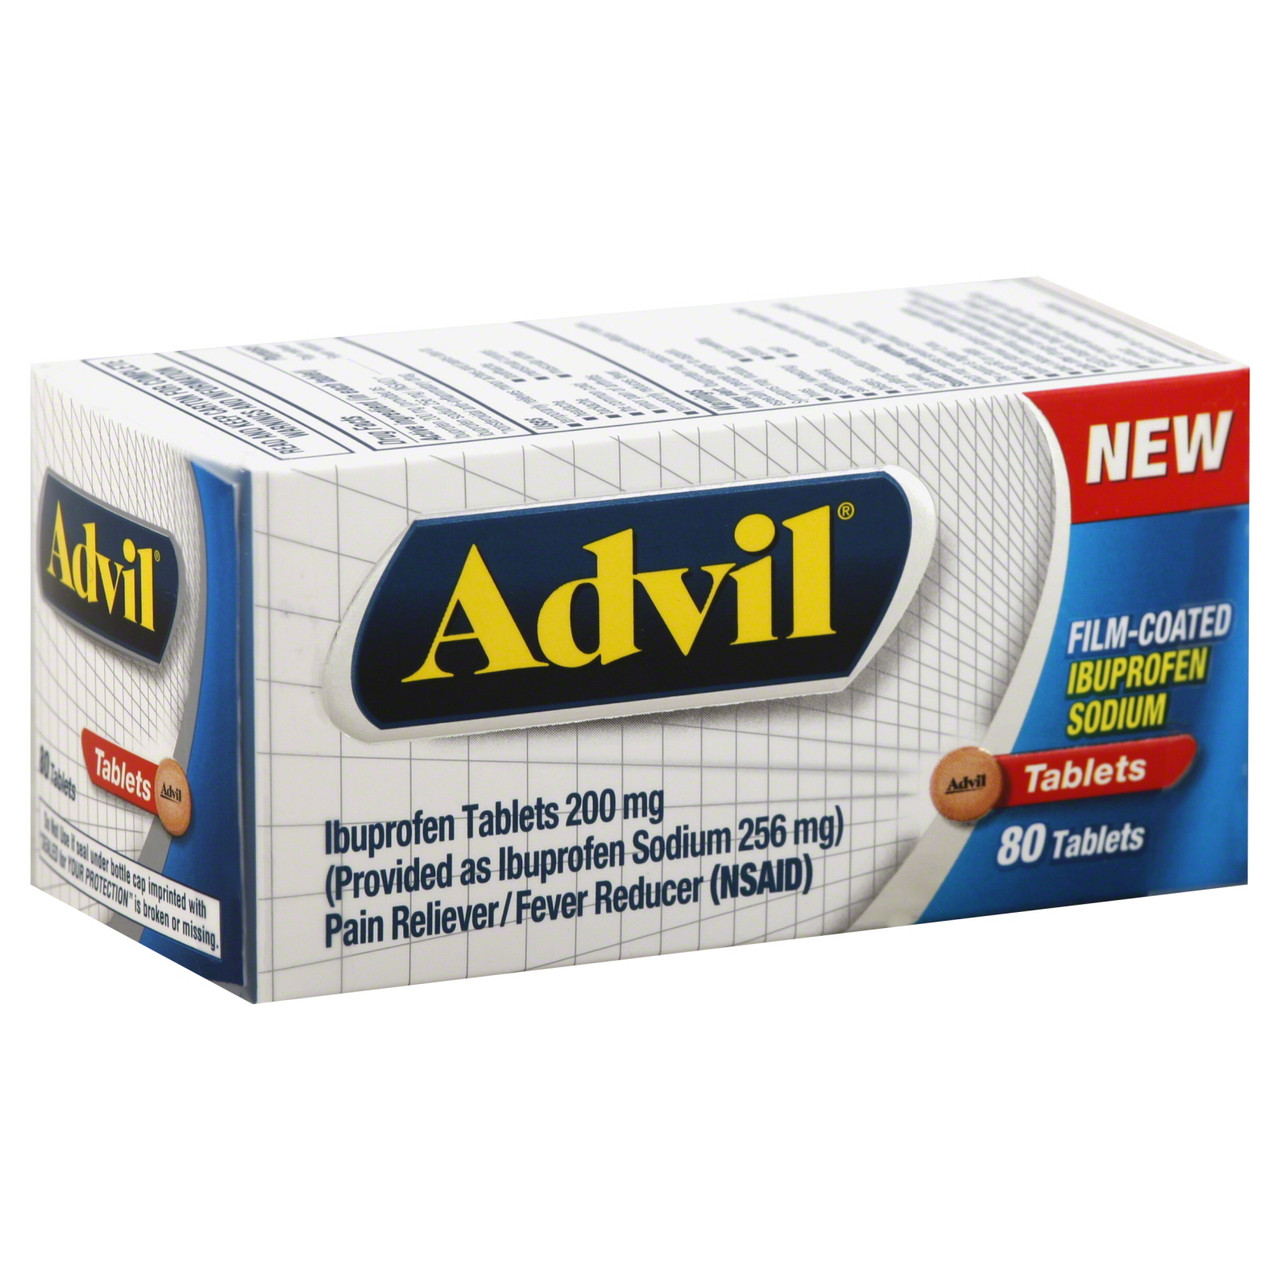 Advil Ibuprofen, 200 Mg, Film‑Coated Tablets ‑ 80 Count